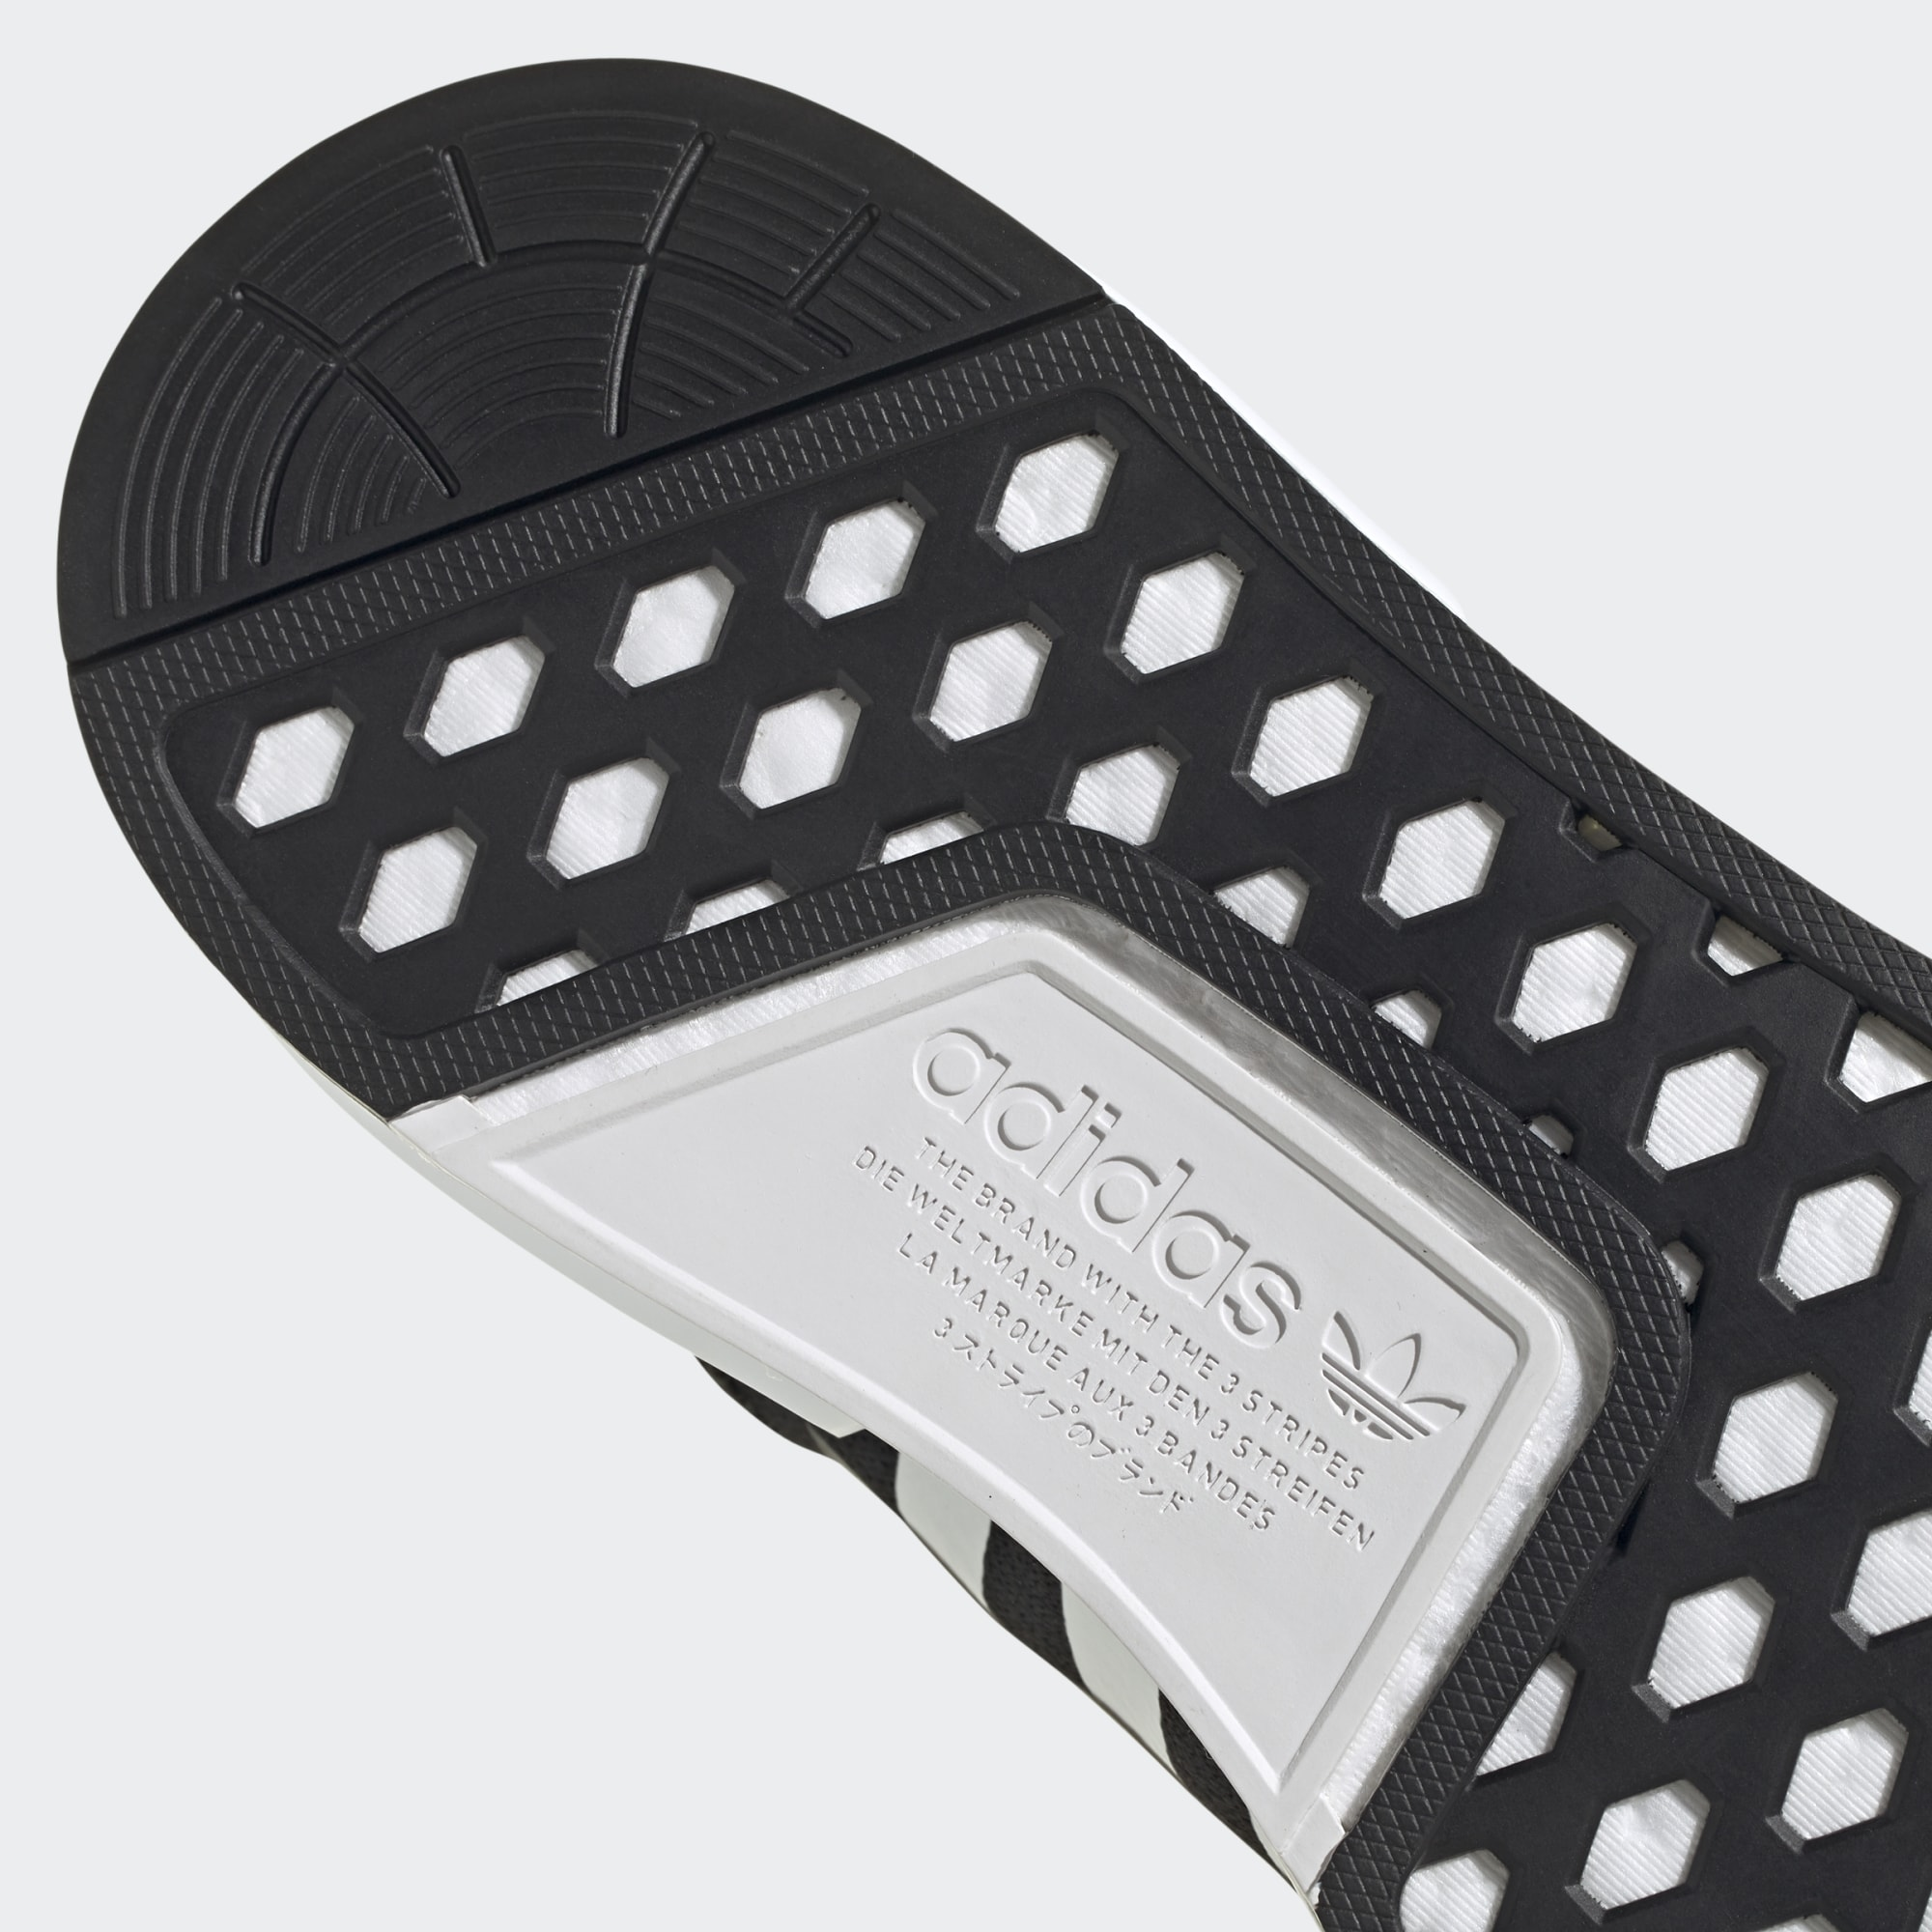 NMD_R1_V2_Shoes_Black_FV9021_42_detail.jpg